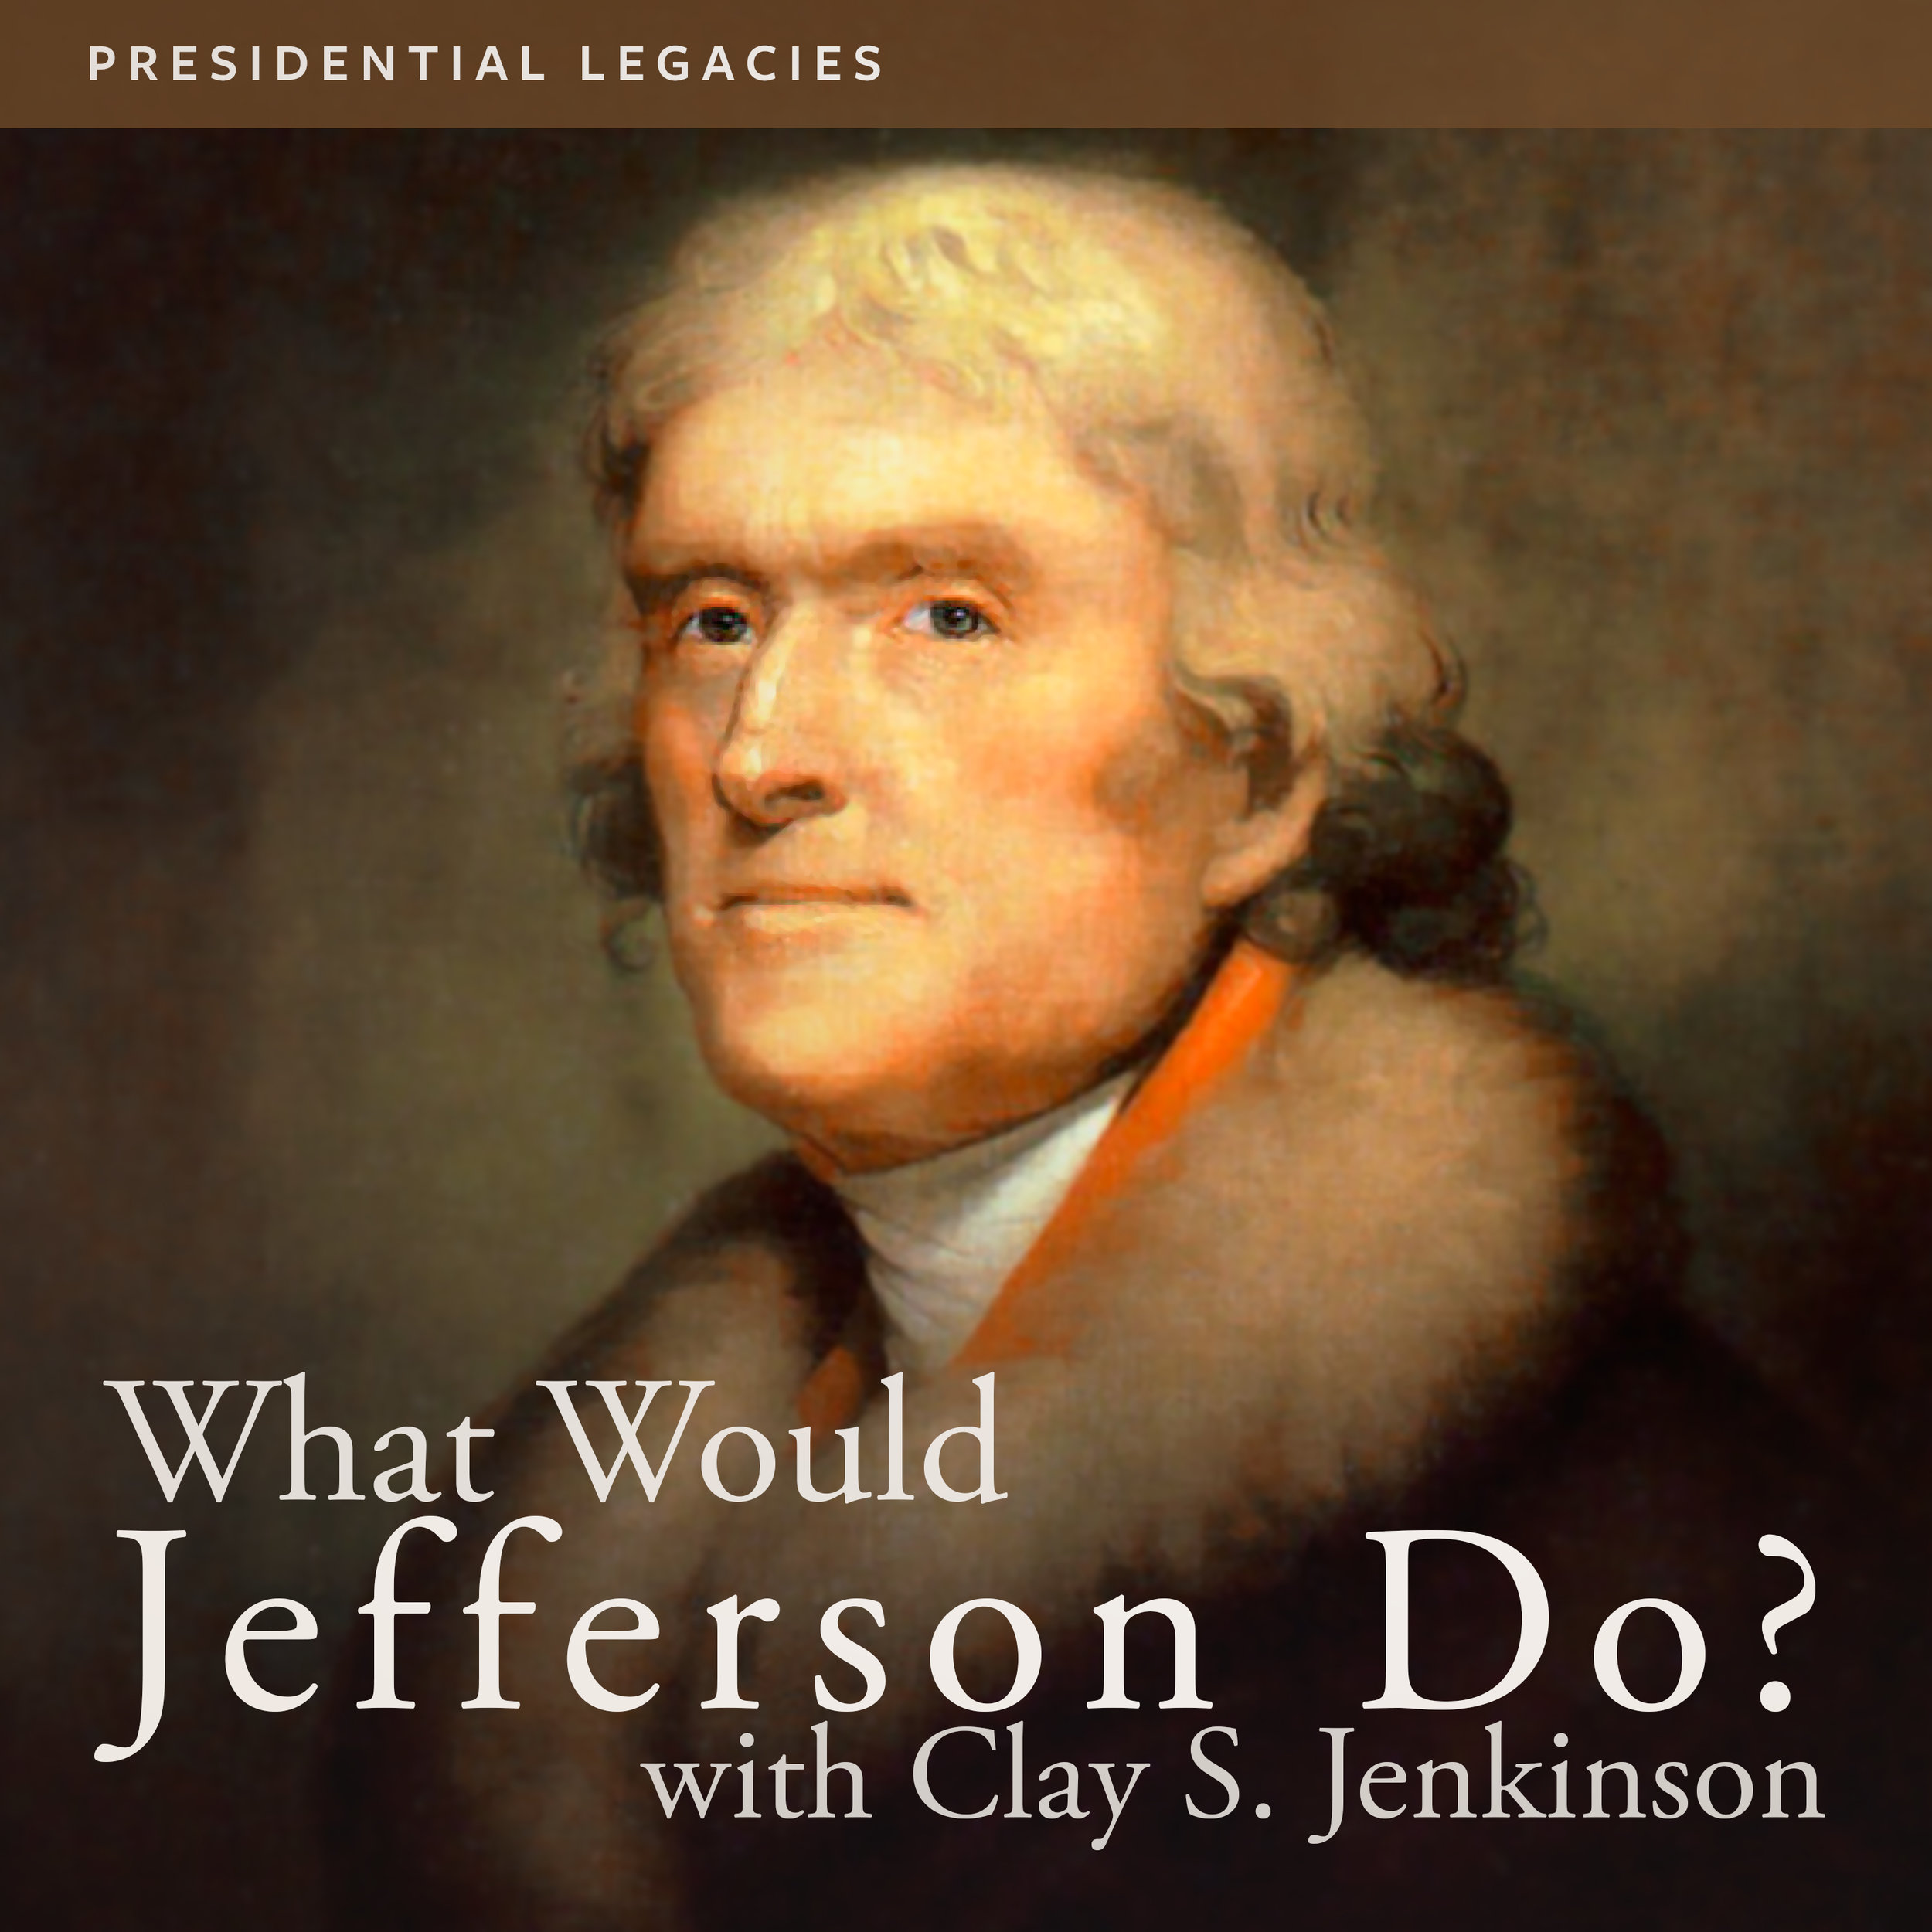 WWTJD_1264 Presidential Legacies.jpg